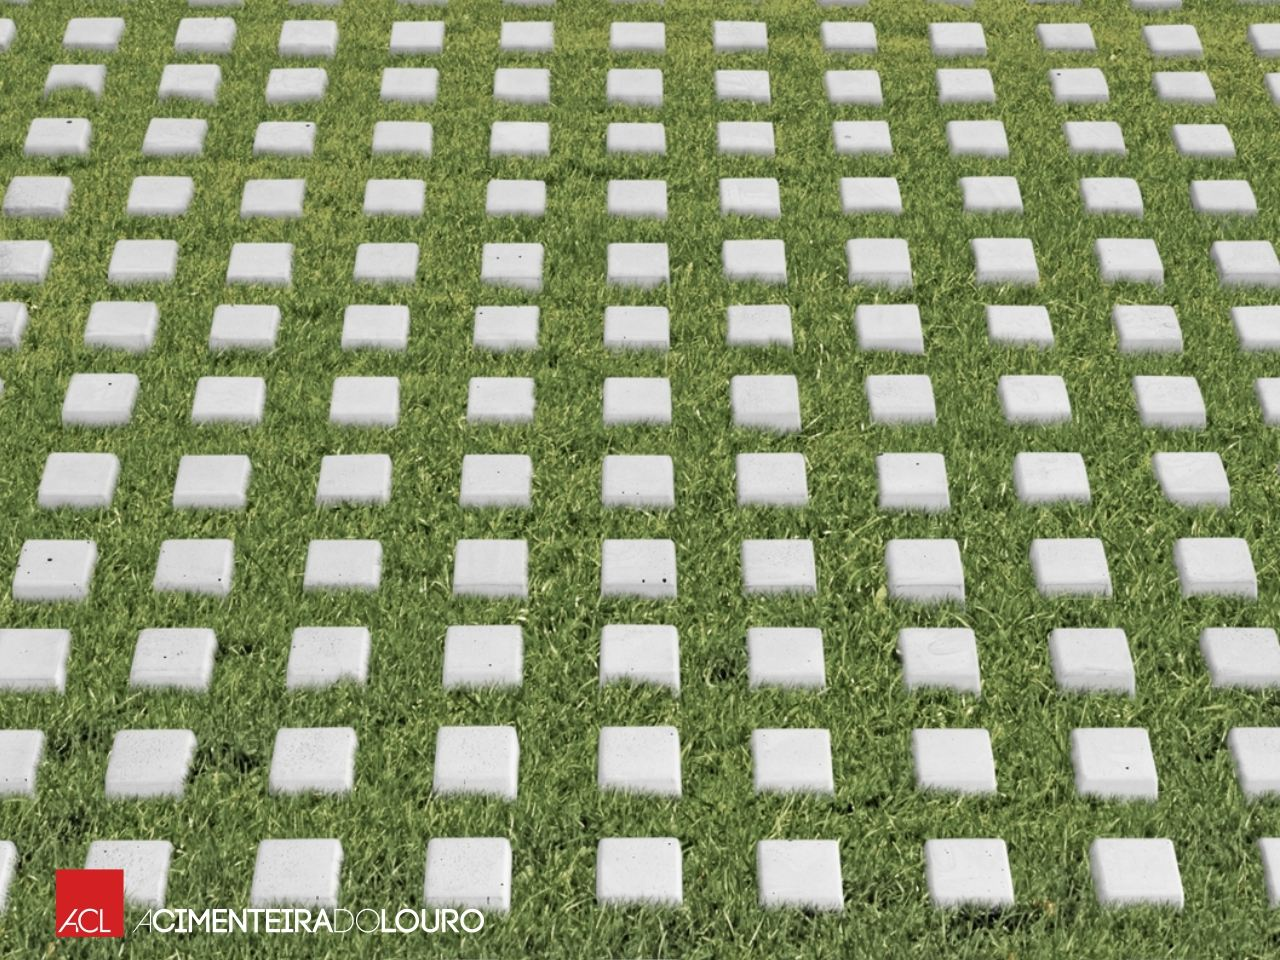 rasengitterstein aus beton pitonada by acl. Black Bedroom Furniture Sets. Home Design Ideas